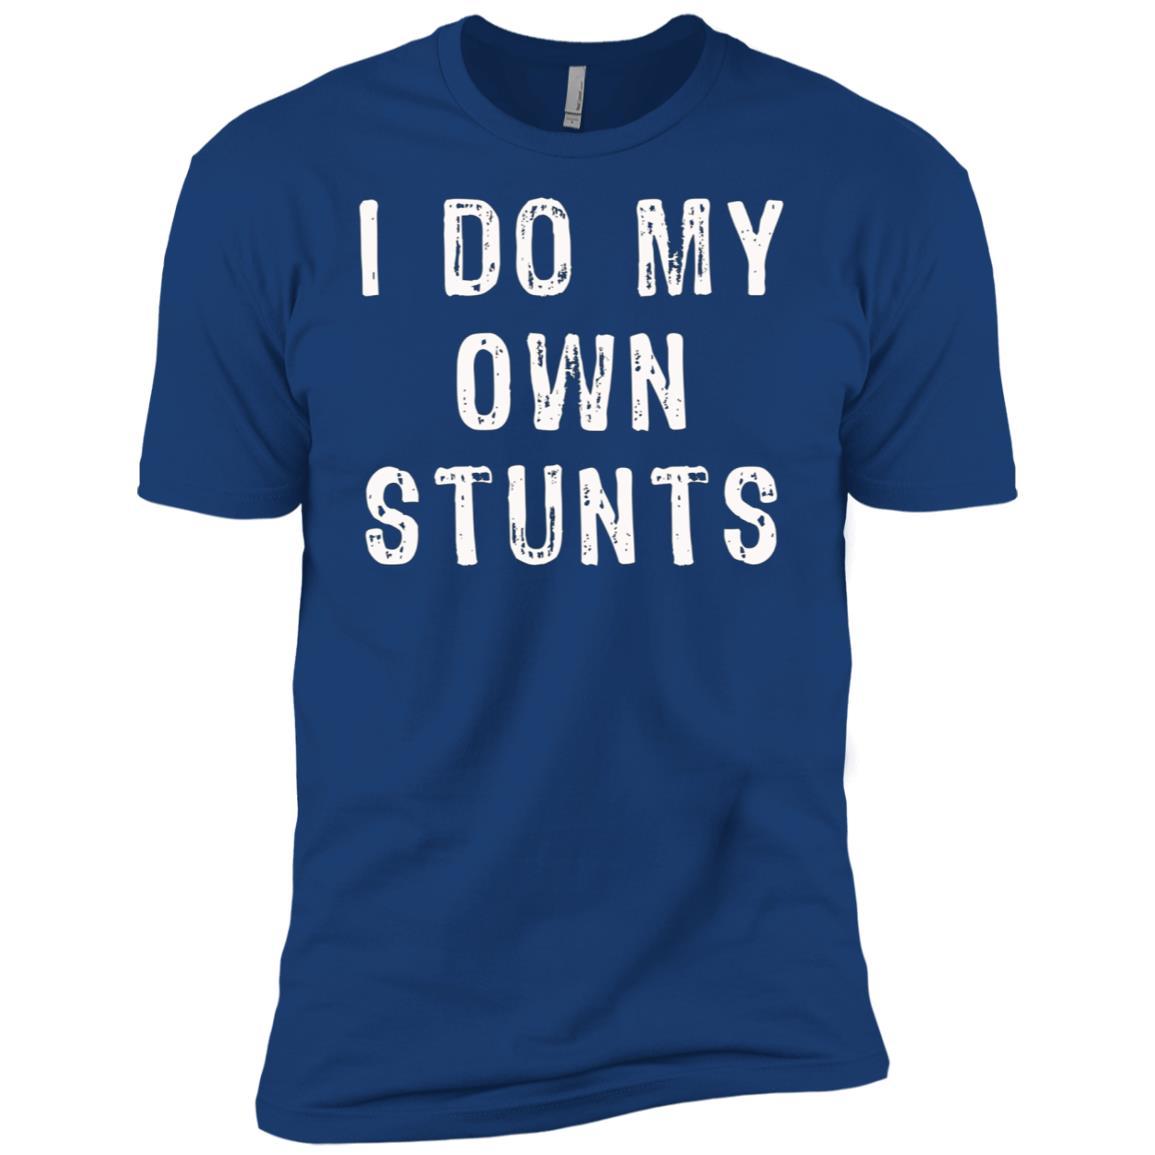 I Do My Own Stunts Funny Men Short Sleeve T-Shirt